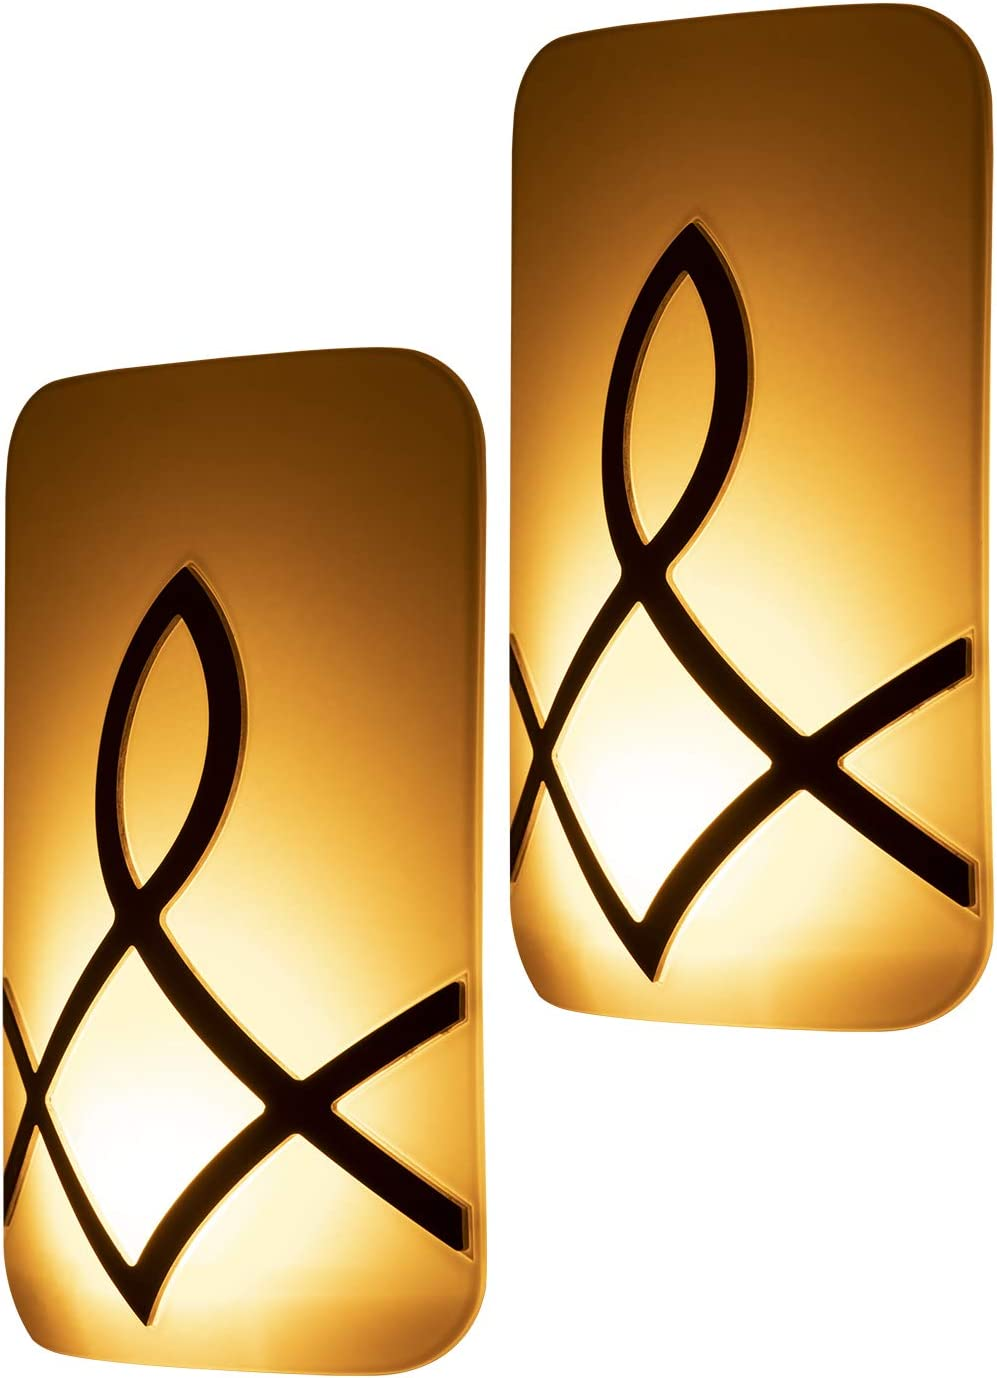 GE Enbrighten SleepLite LED Amber Night Light, 2 Pack, Candle Glow, Hi/Low Dimmable, Dusk-to-Dawn, Melatonin, Natural Sleep Aid, Ideal for Bedroom, Nursery, Bathroom, Oil-Rubbed Bronze, 46453